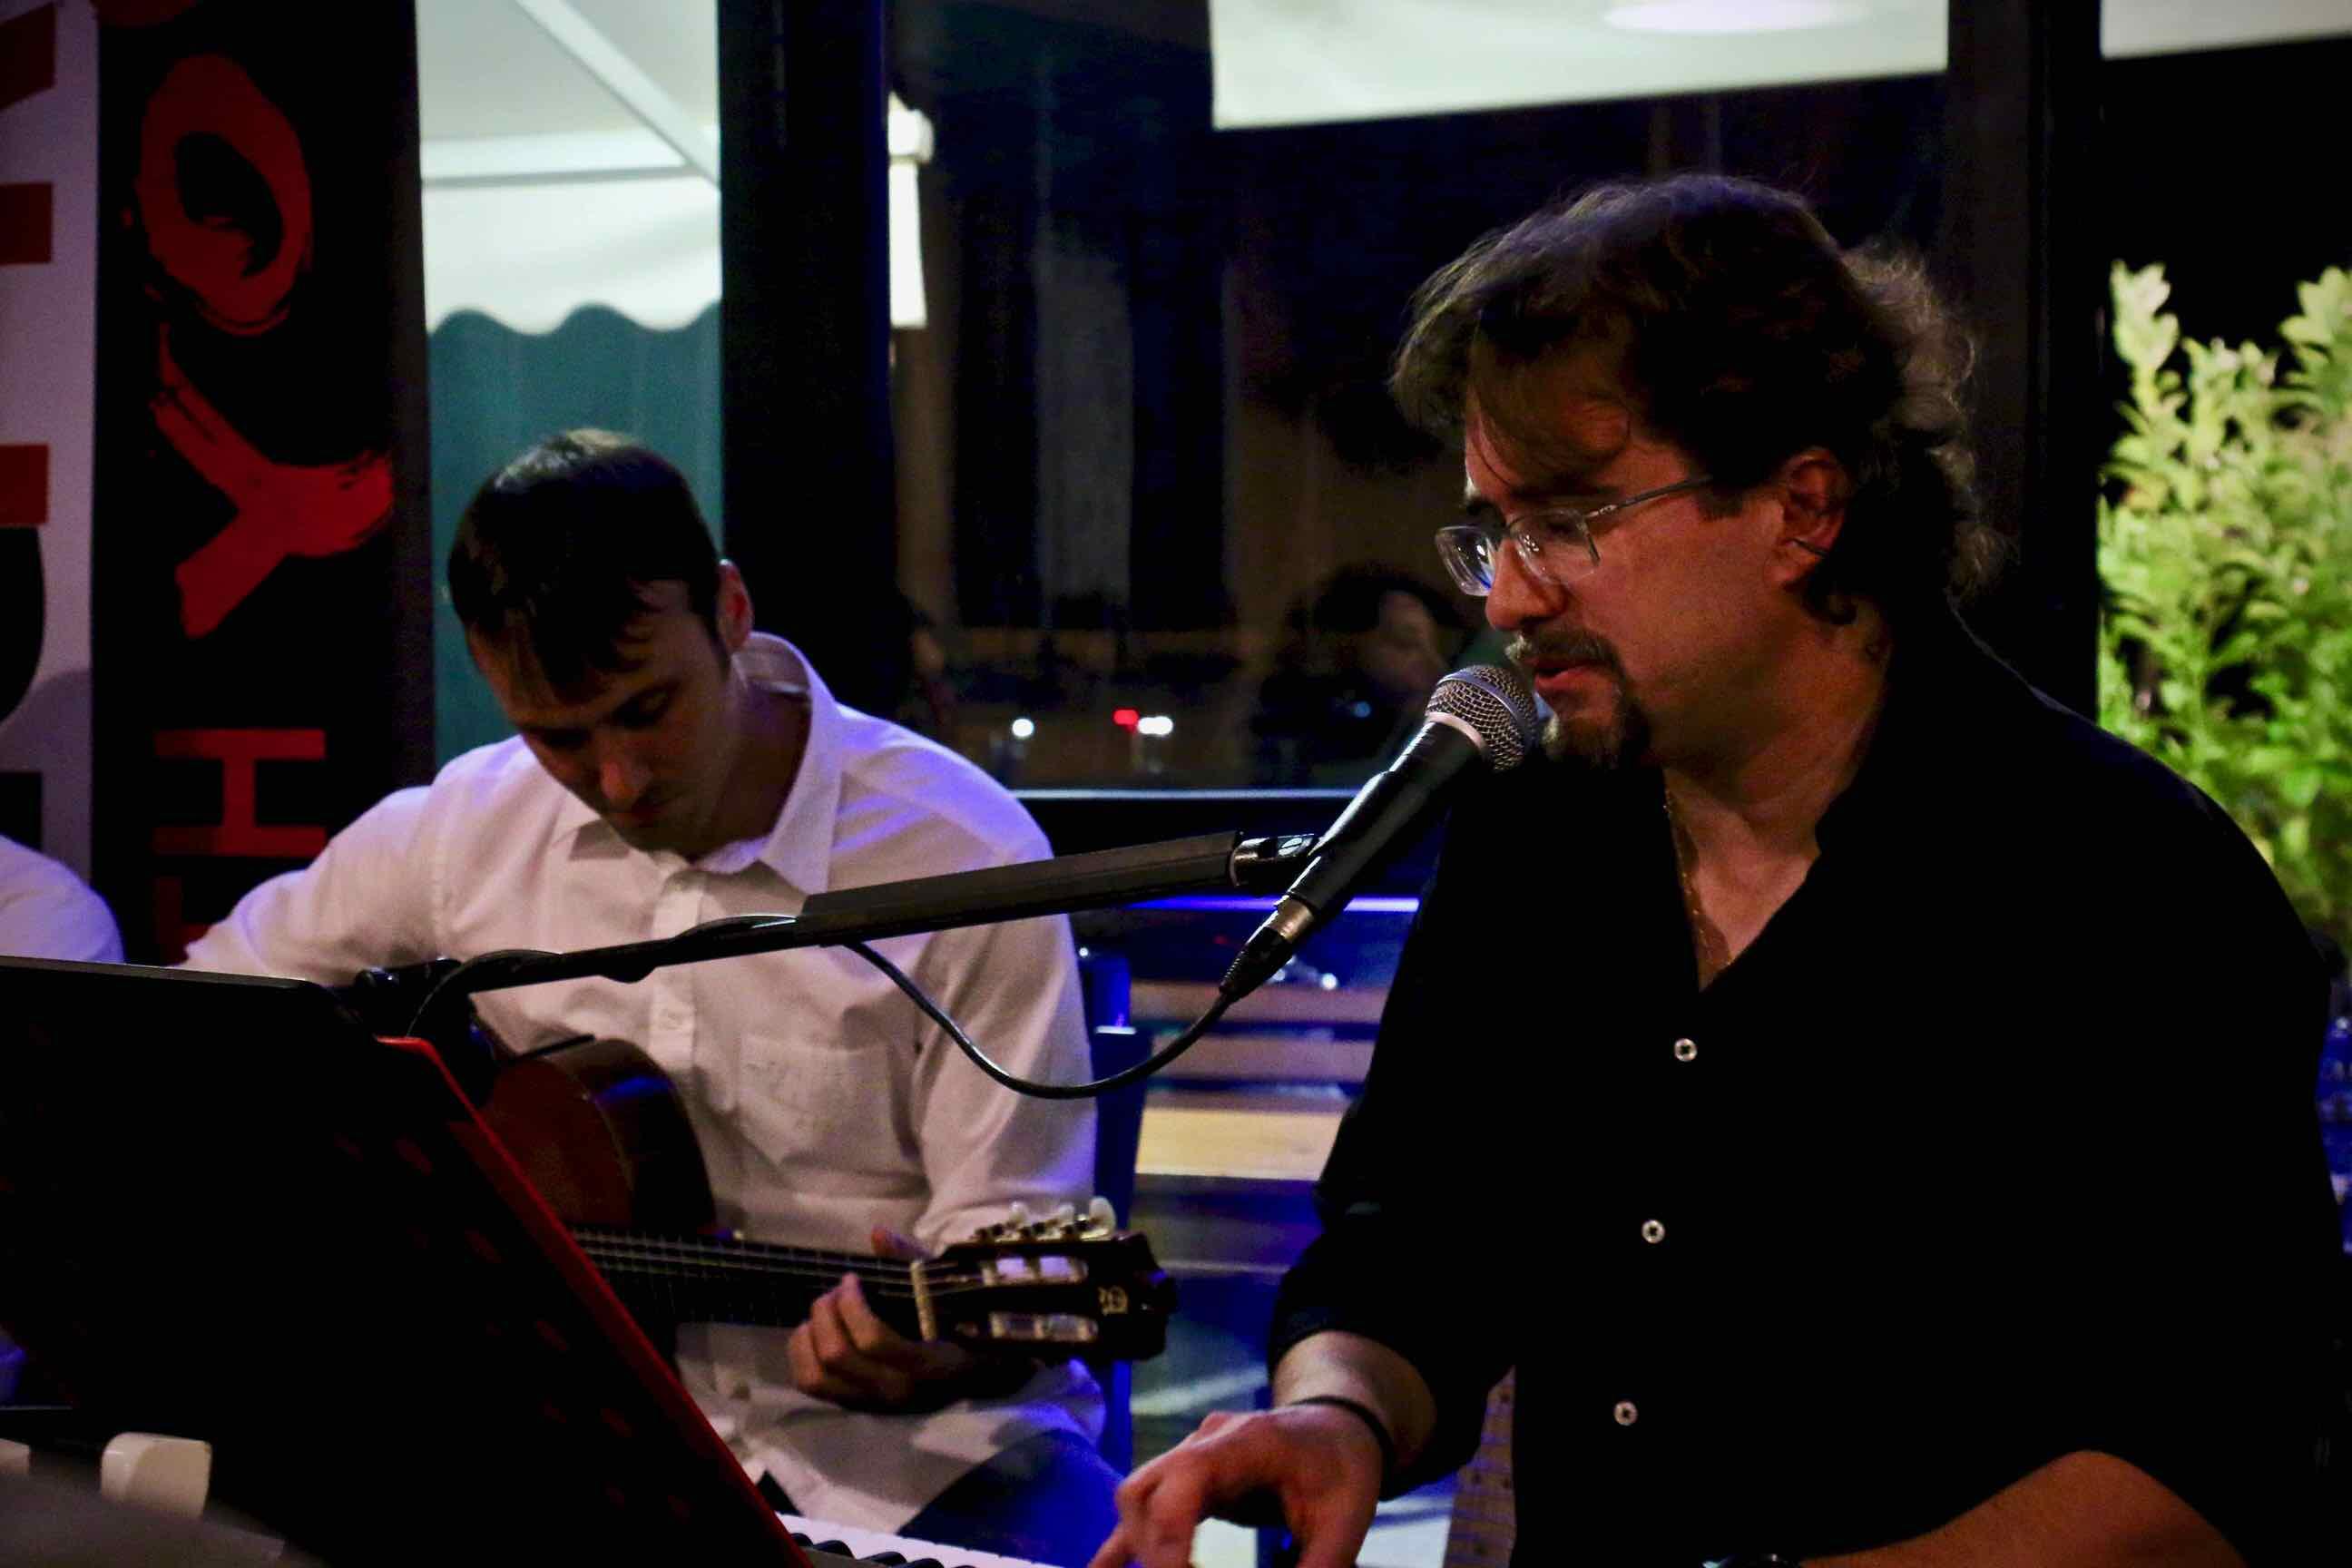 Roberto Frugone Band Live @La Stiva Chiavari 2017.09.28 – 8